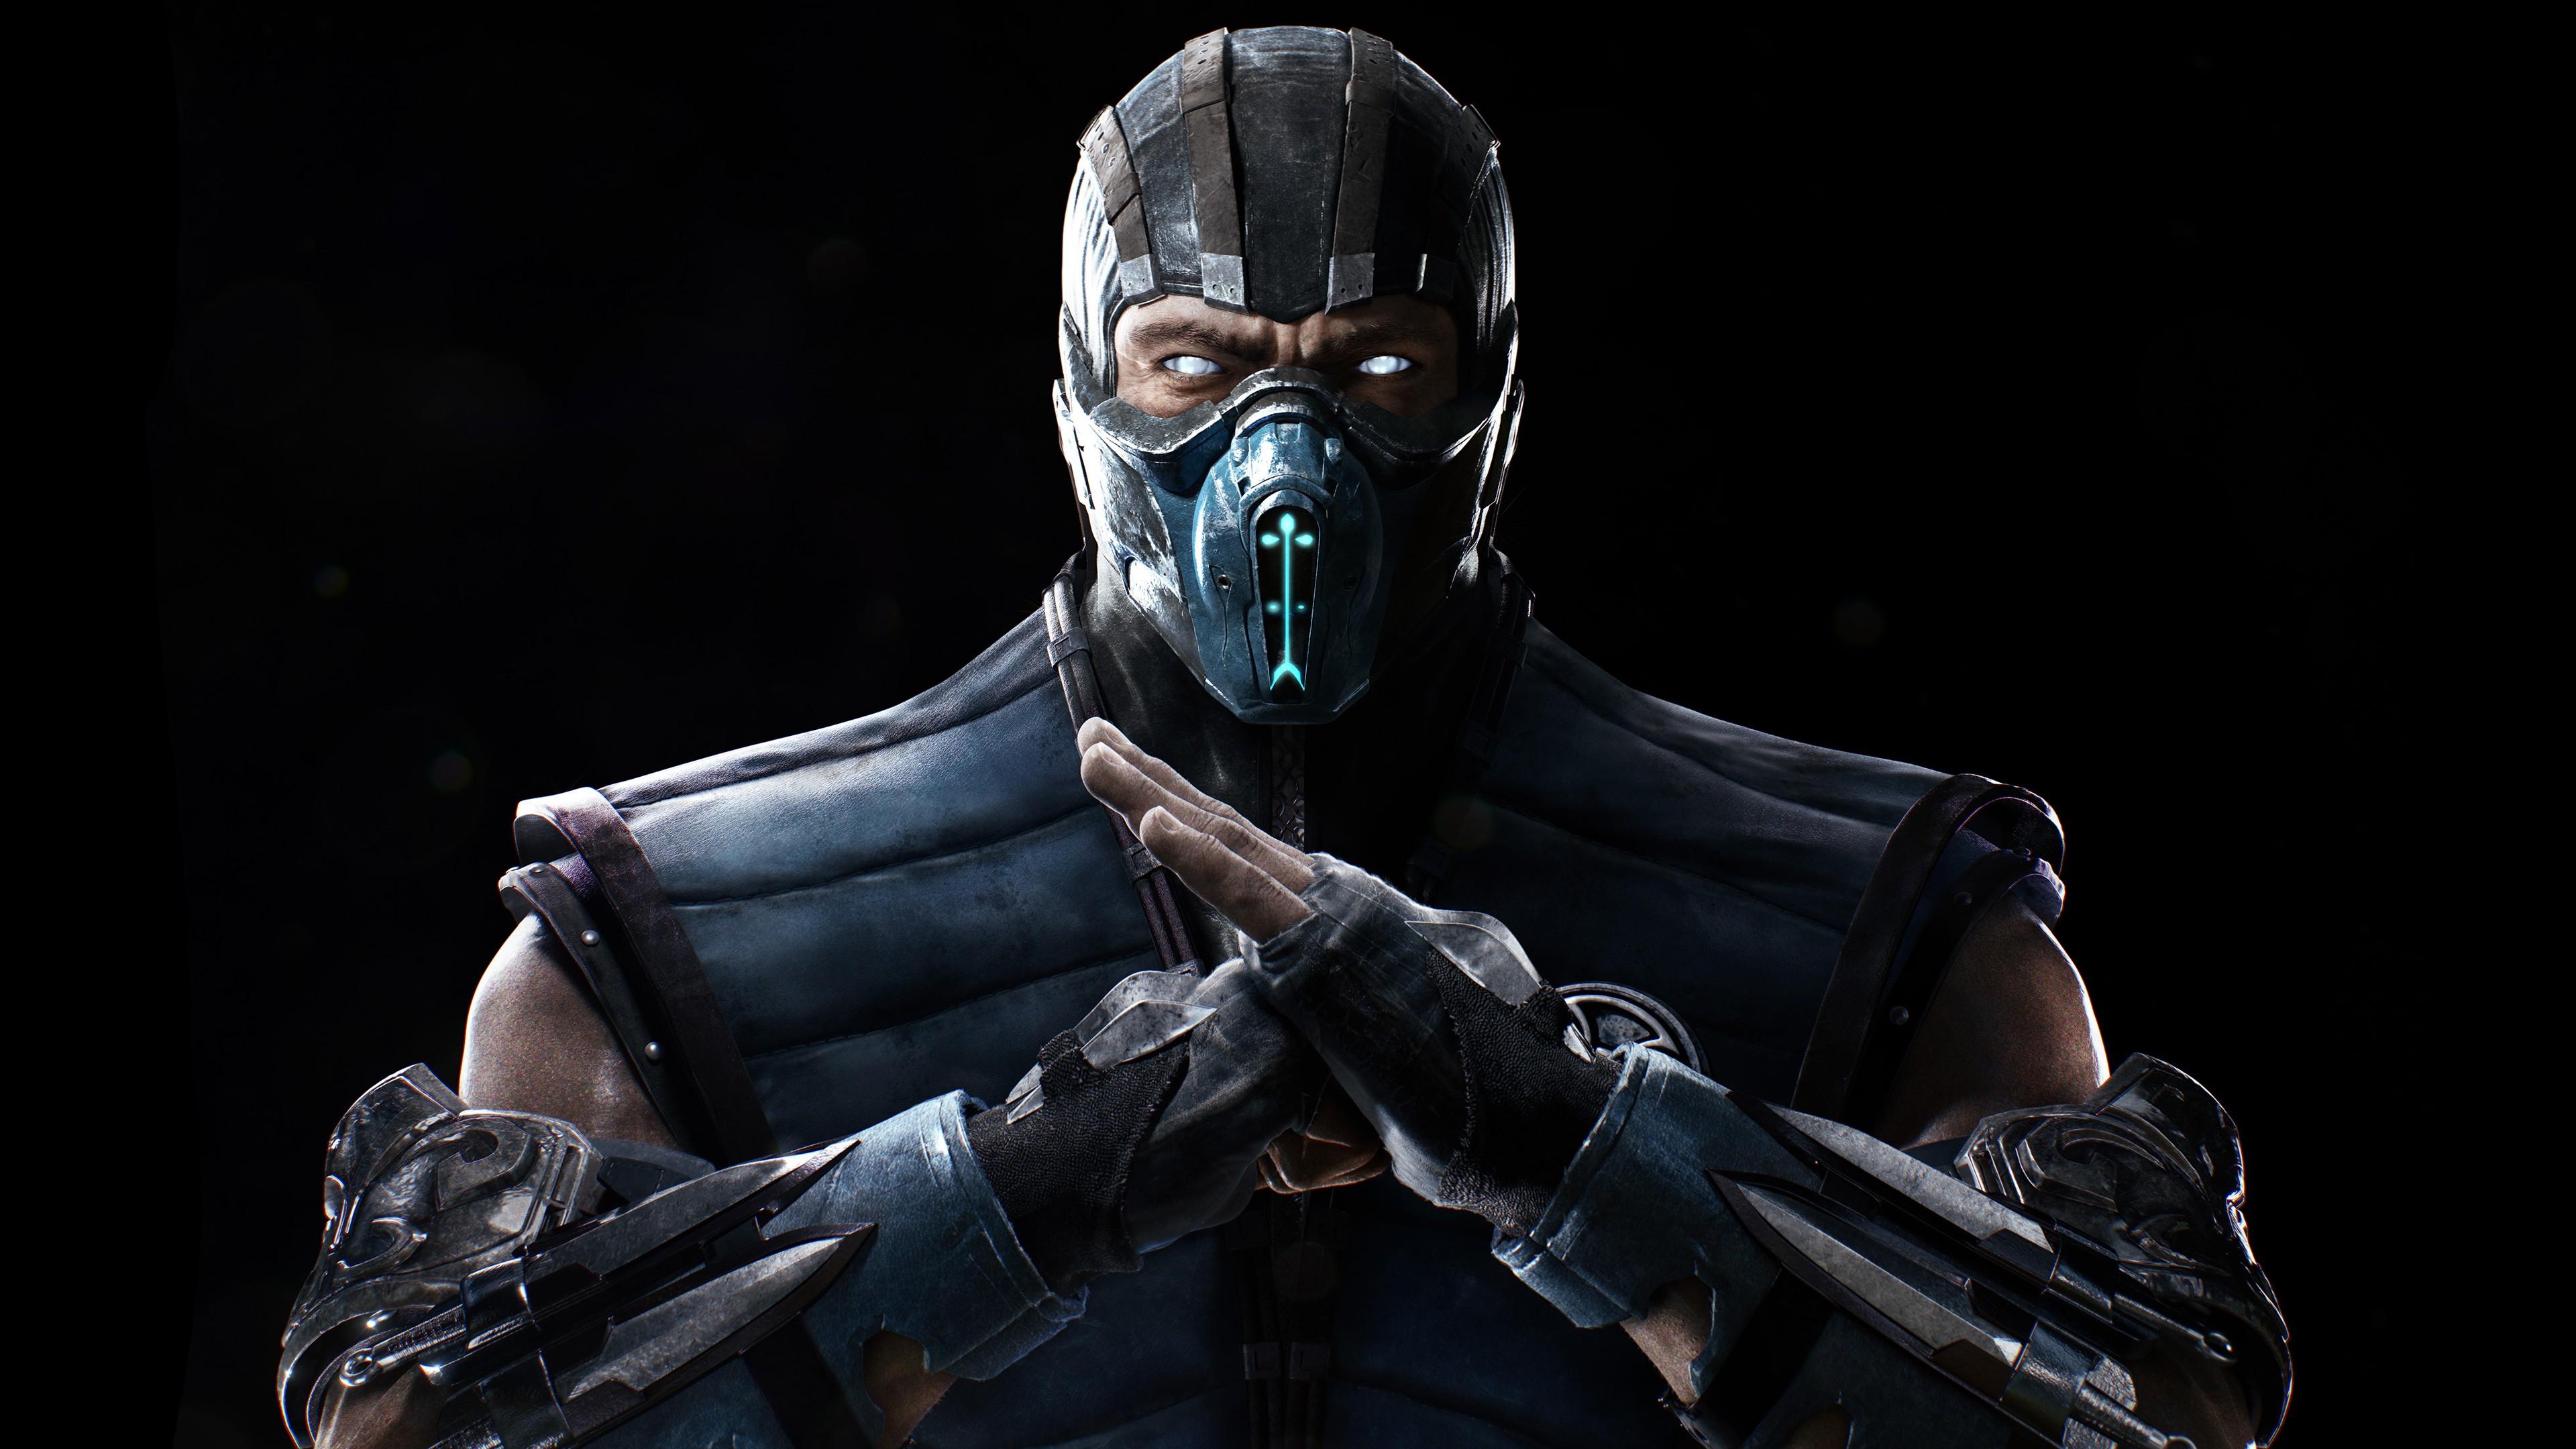 Mortal Kombat X Wallpapers Hd Iphone Mortal Kombat X Sub Zero 4k 5k Wallpapers Hd Wallpapers